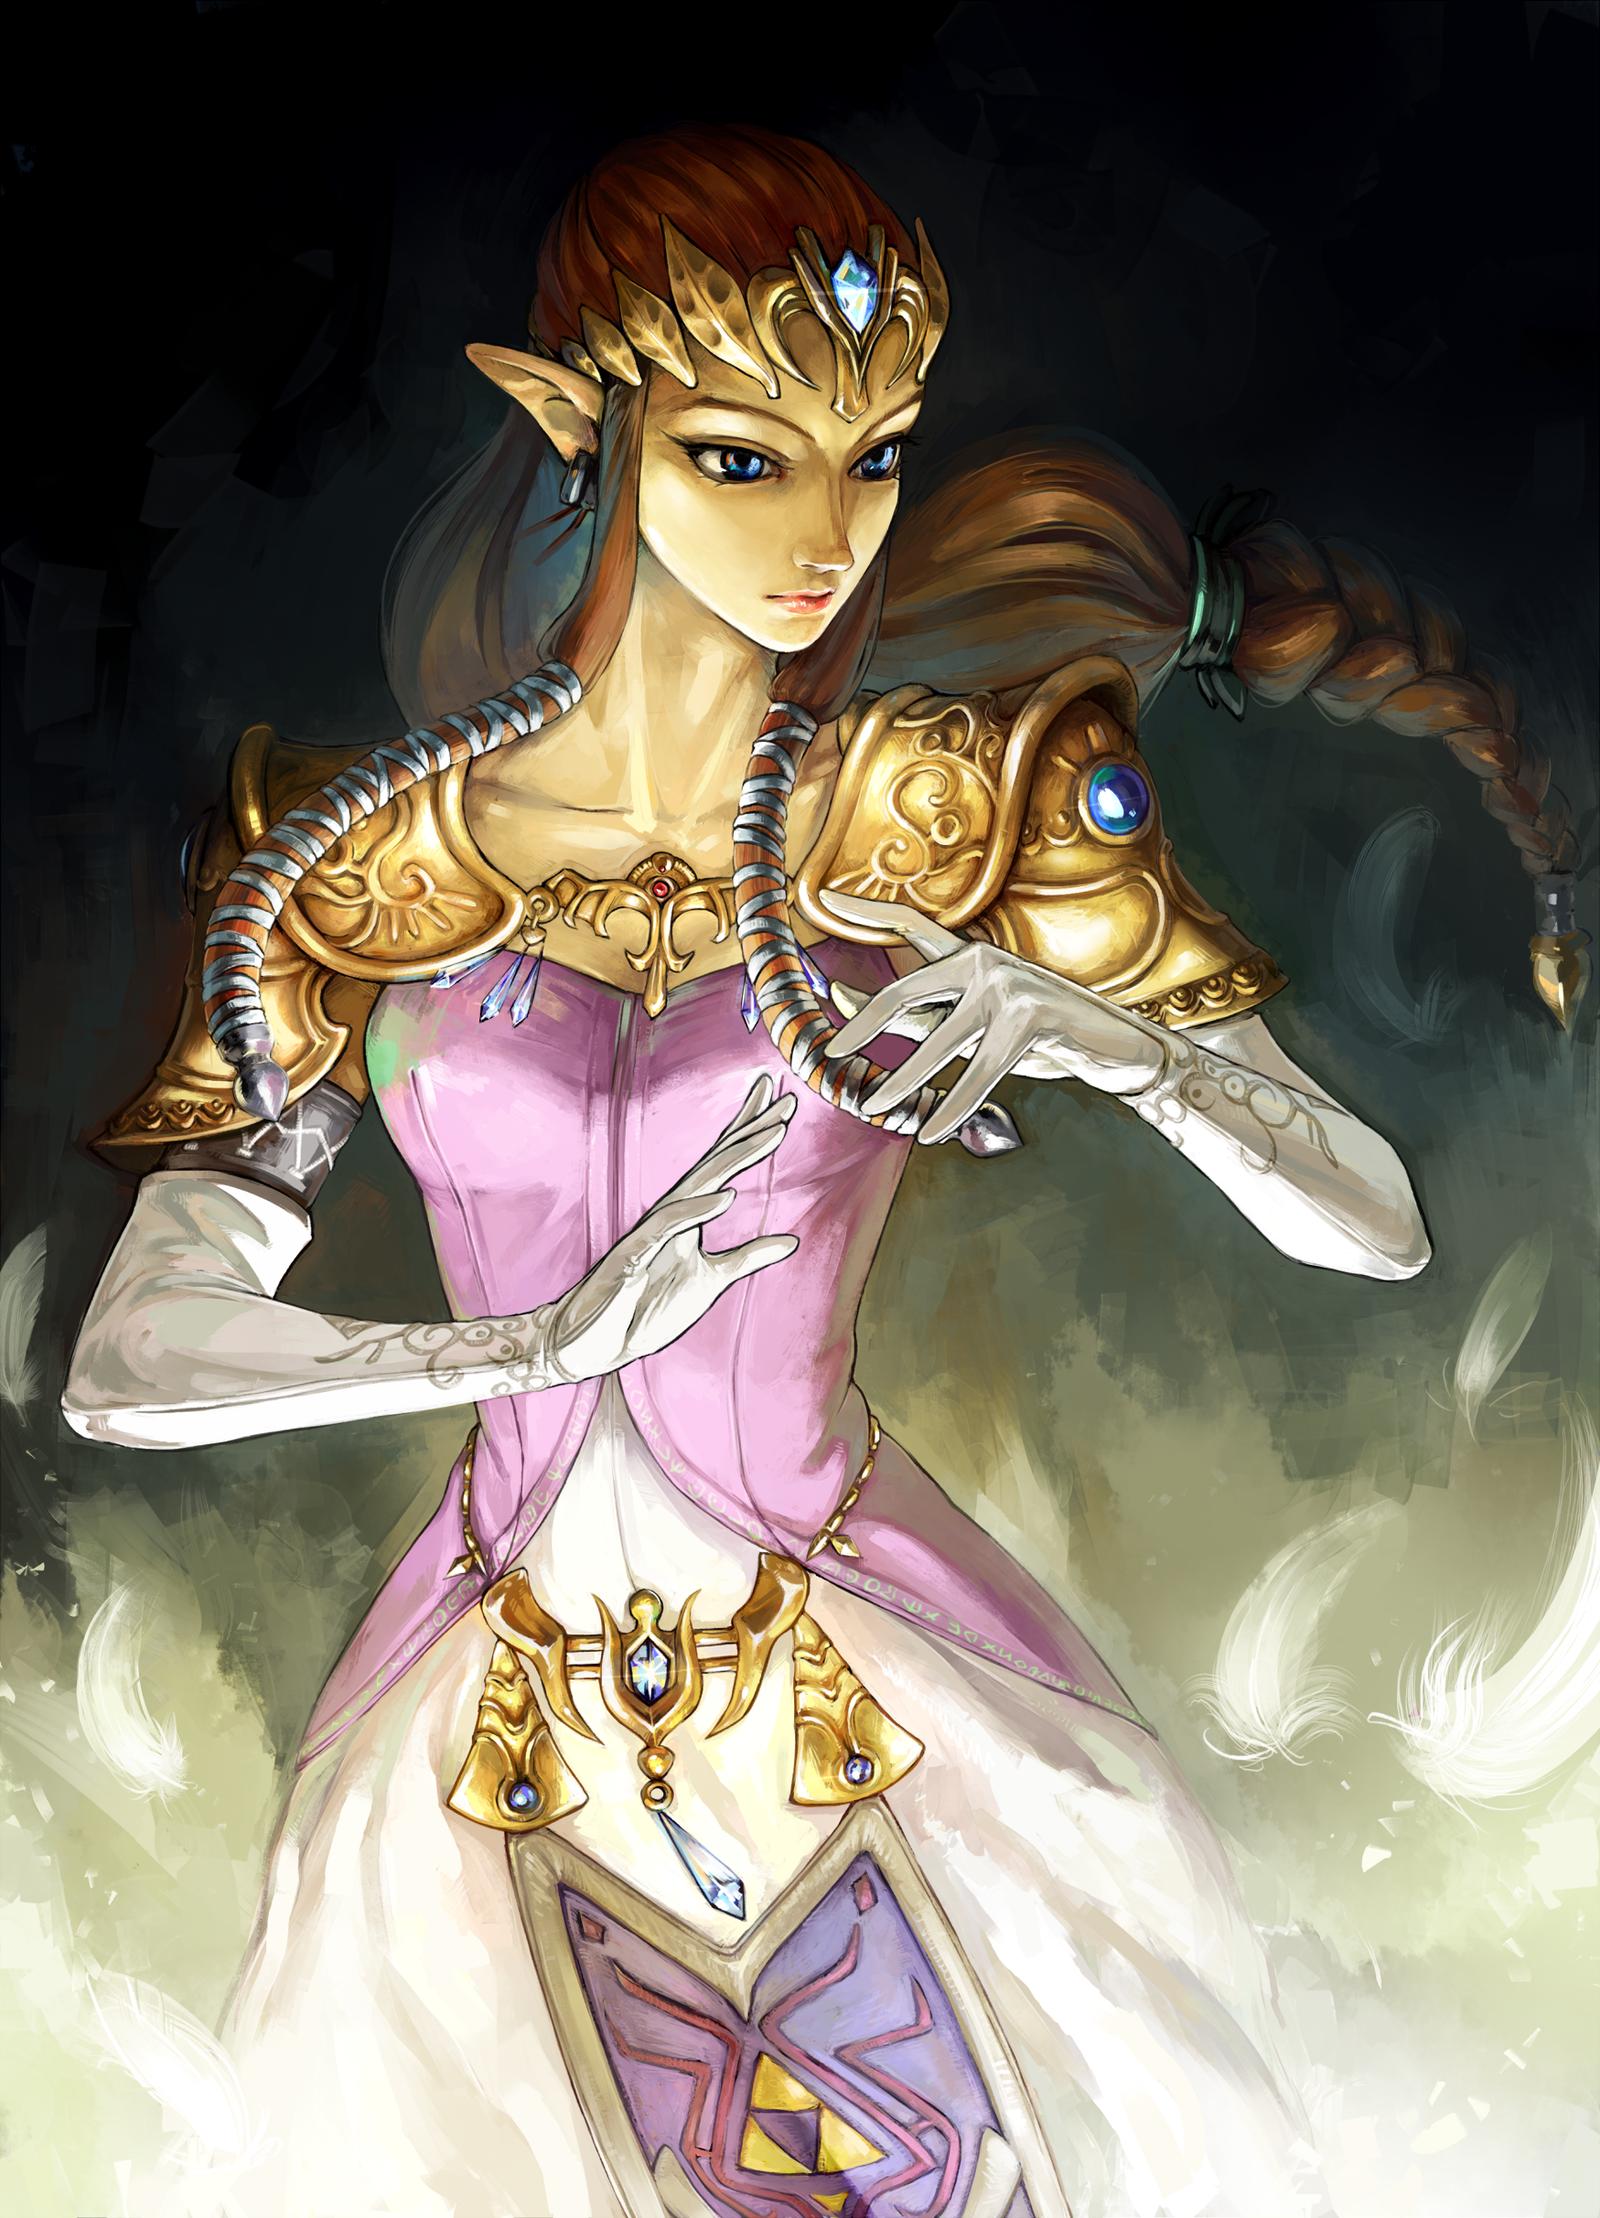 Pin By Aj On Anime Legend Of Zelda Twilight Princess